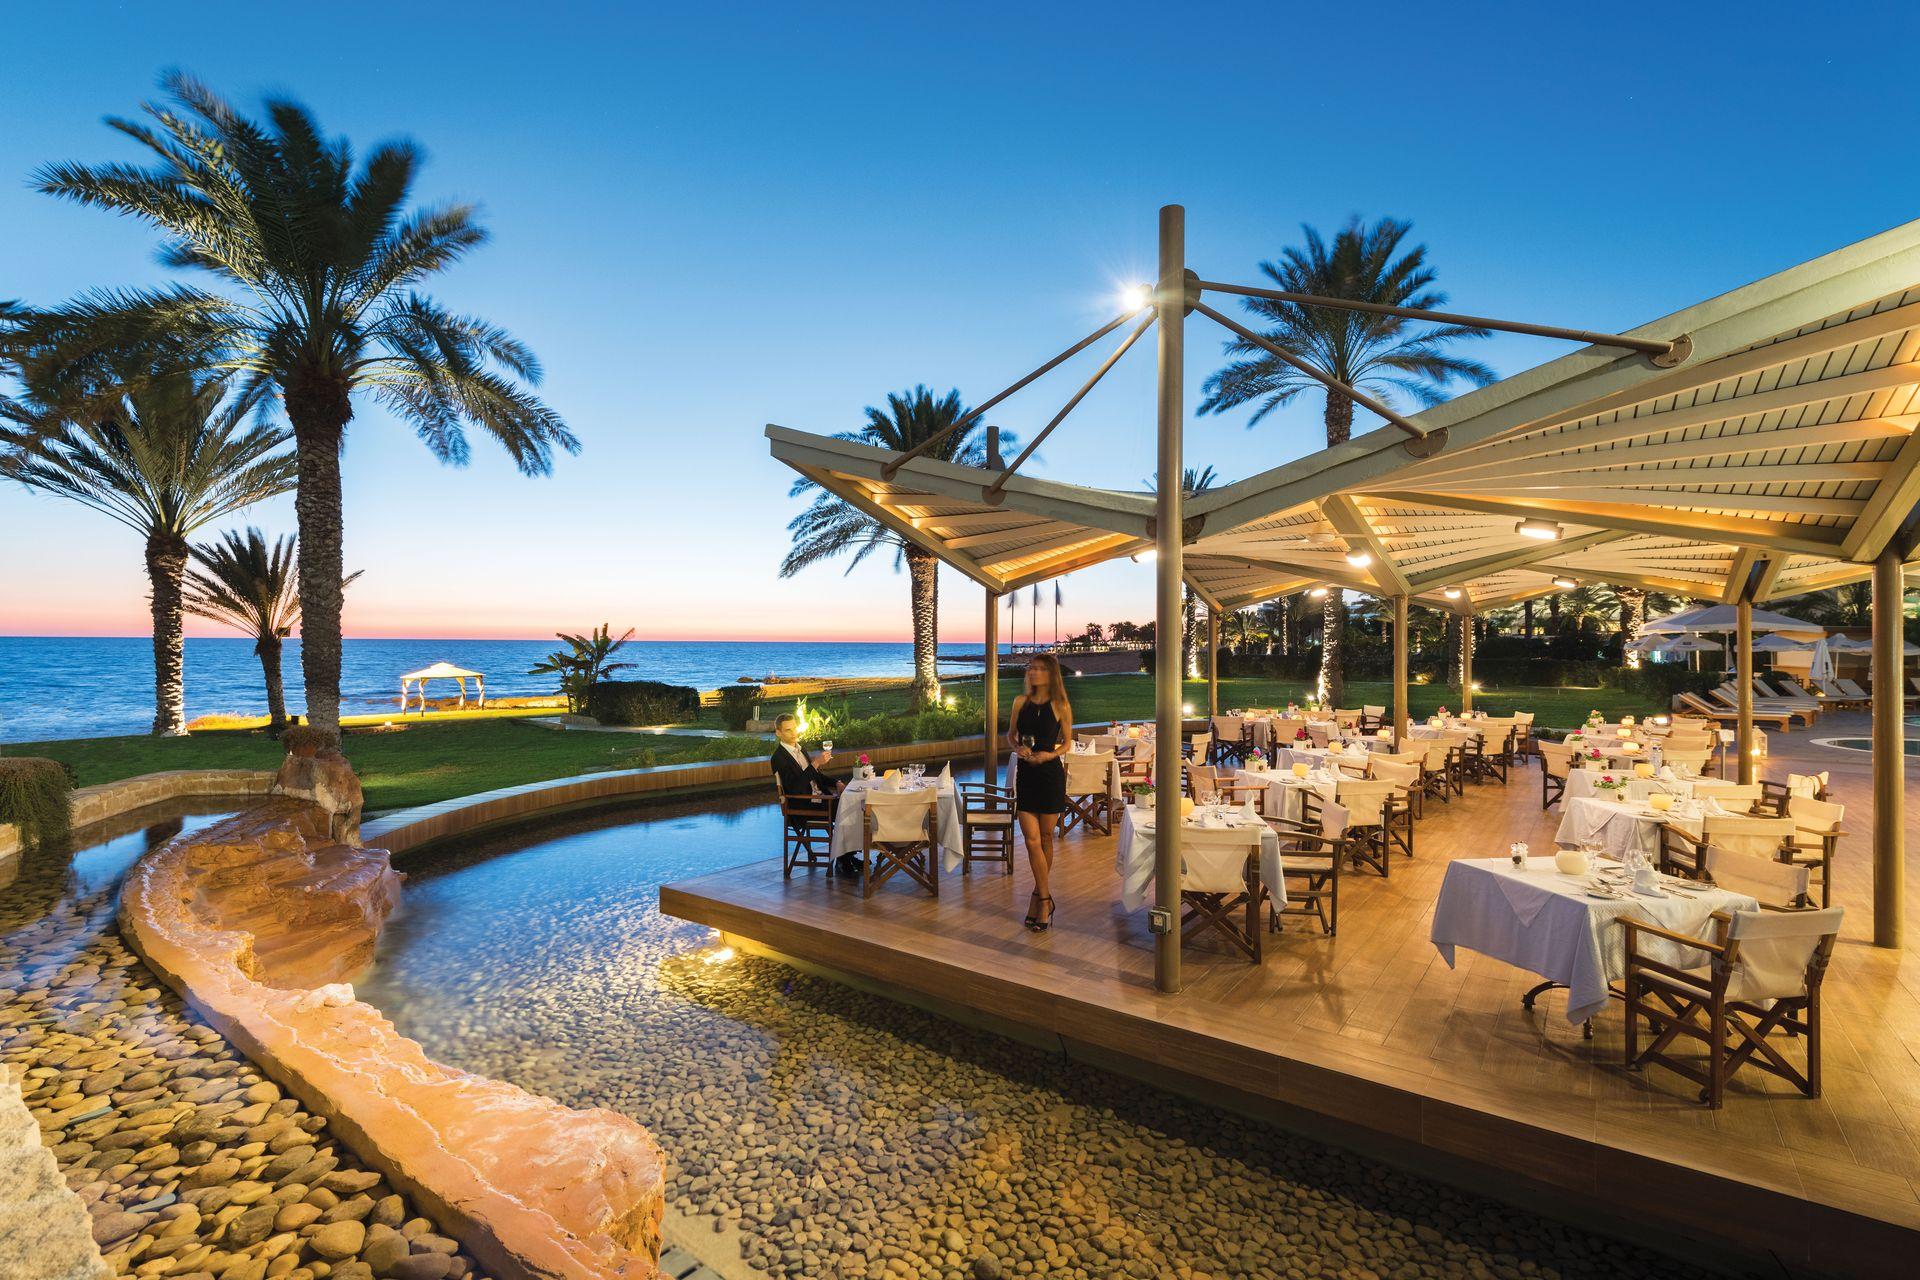 _16 athena beach hotel adonis restaurant_resized